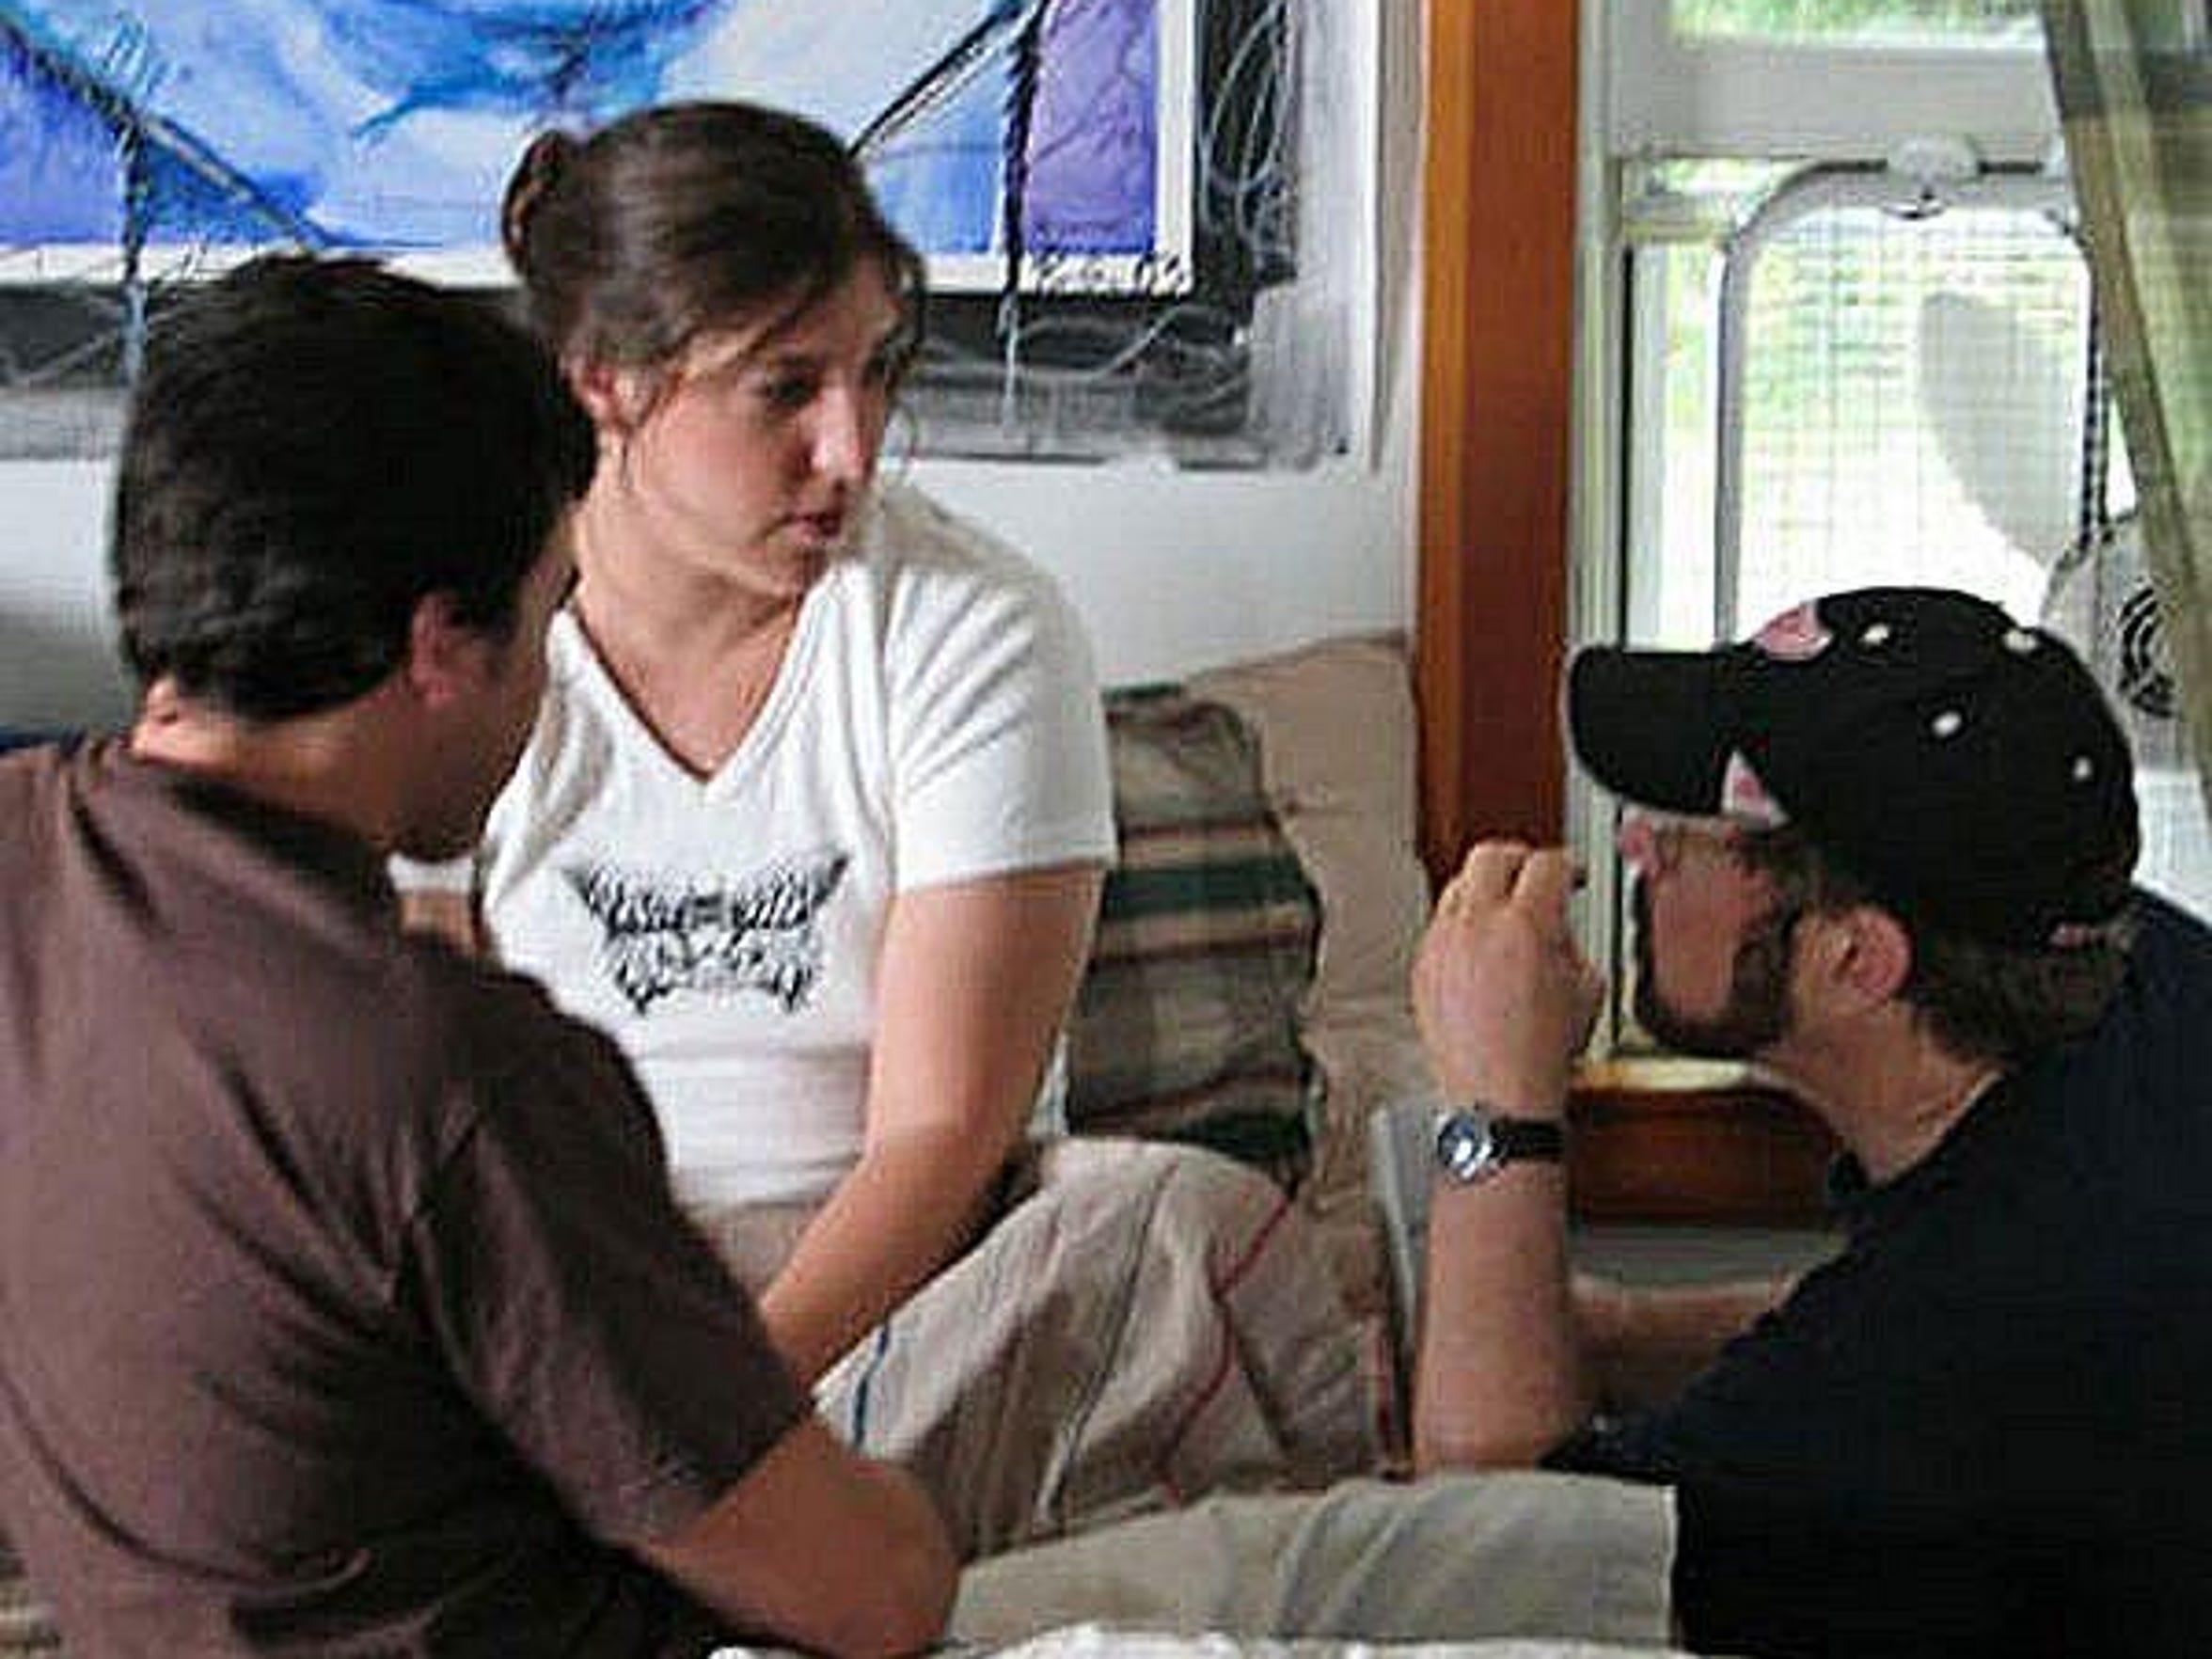 Photo 1 - David directing Mayim Bialik